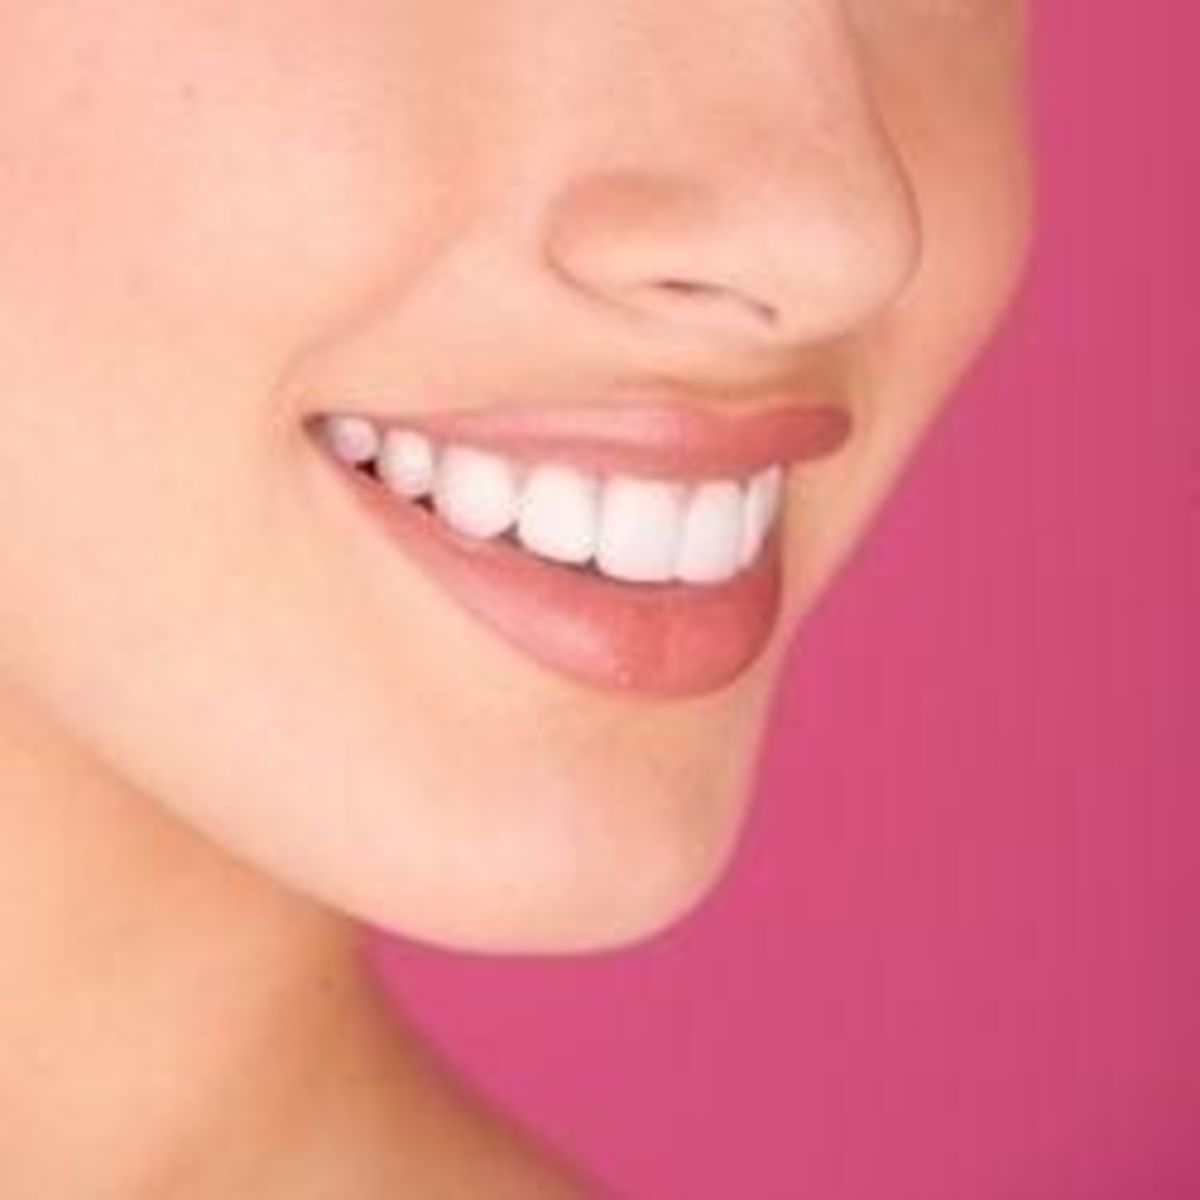 Listerine vs Plax, vs Scope, vs Crest, vs Act - What Is the Best Mouthwash